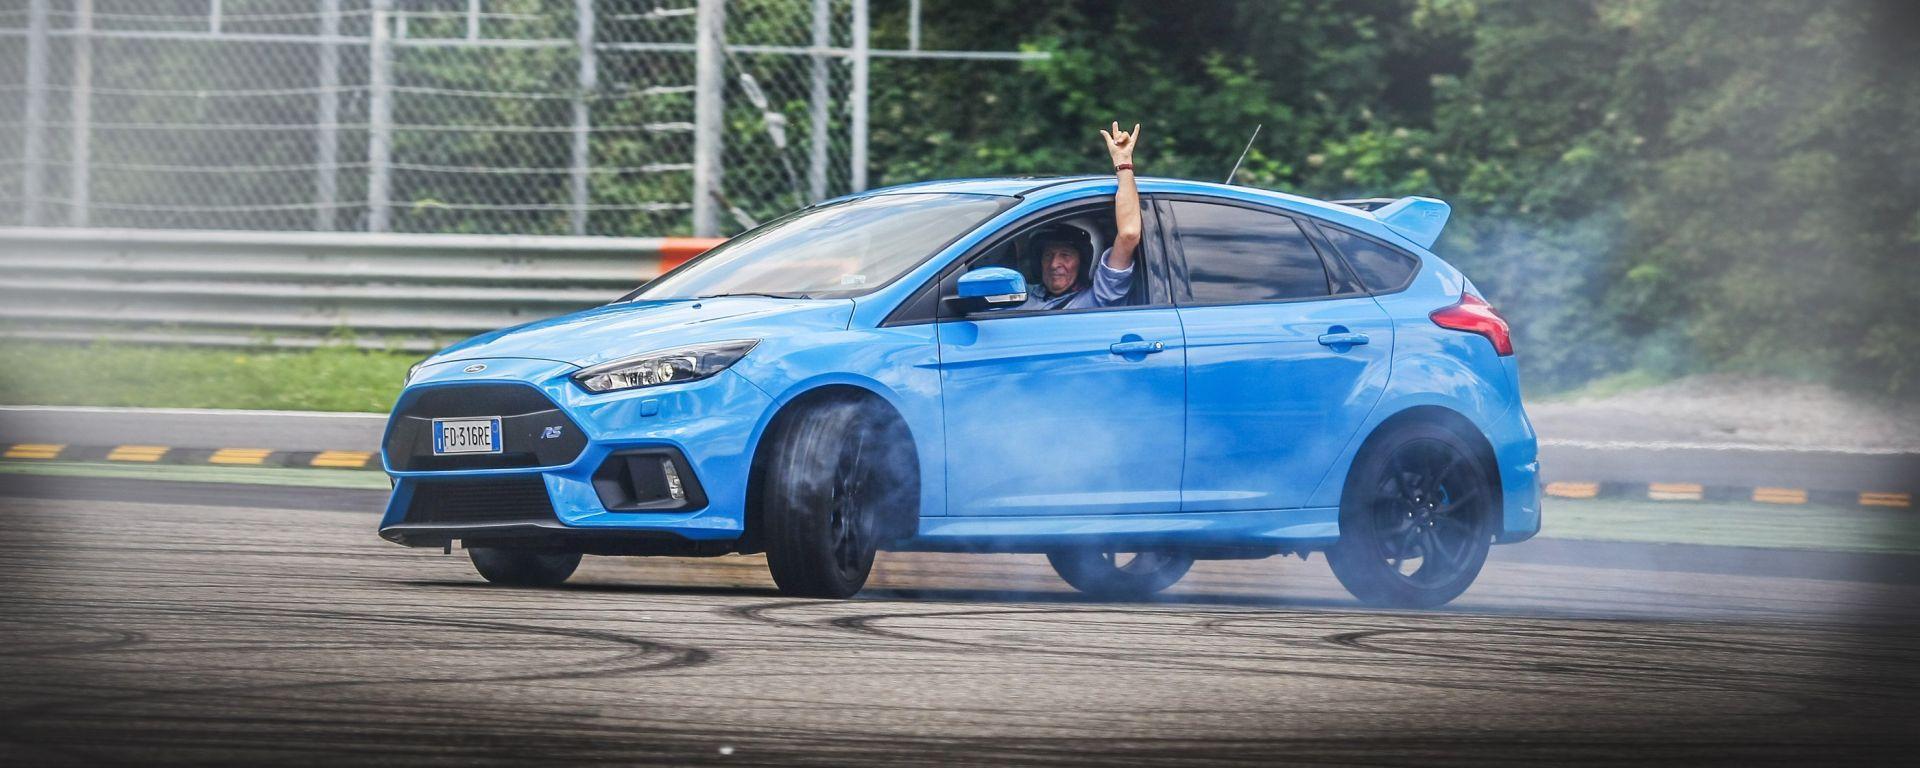 Ford Focus RS: luna park grazie al drift mode